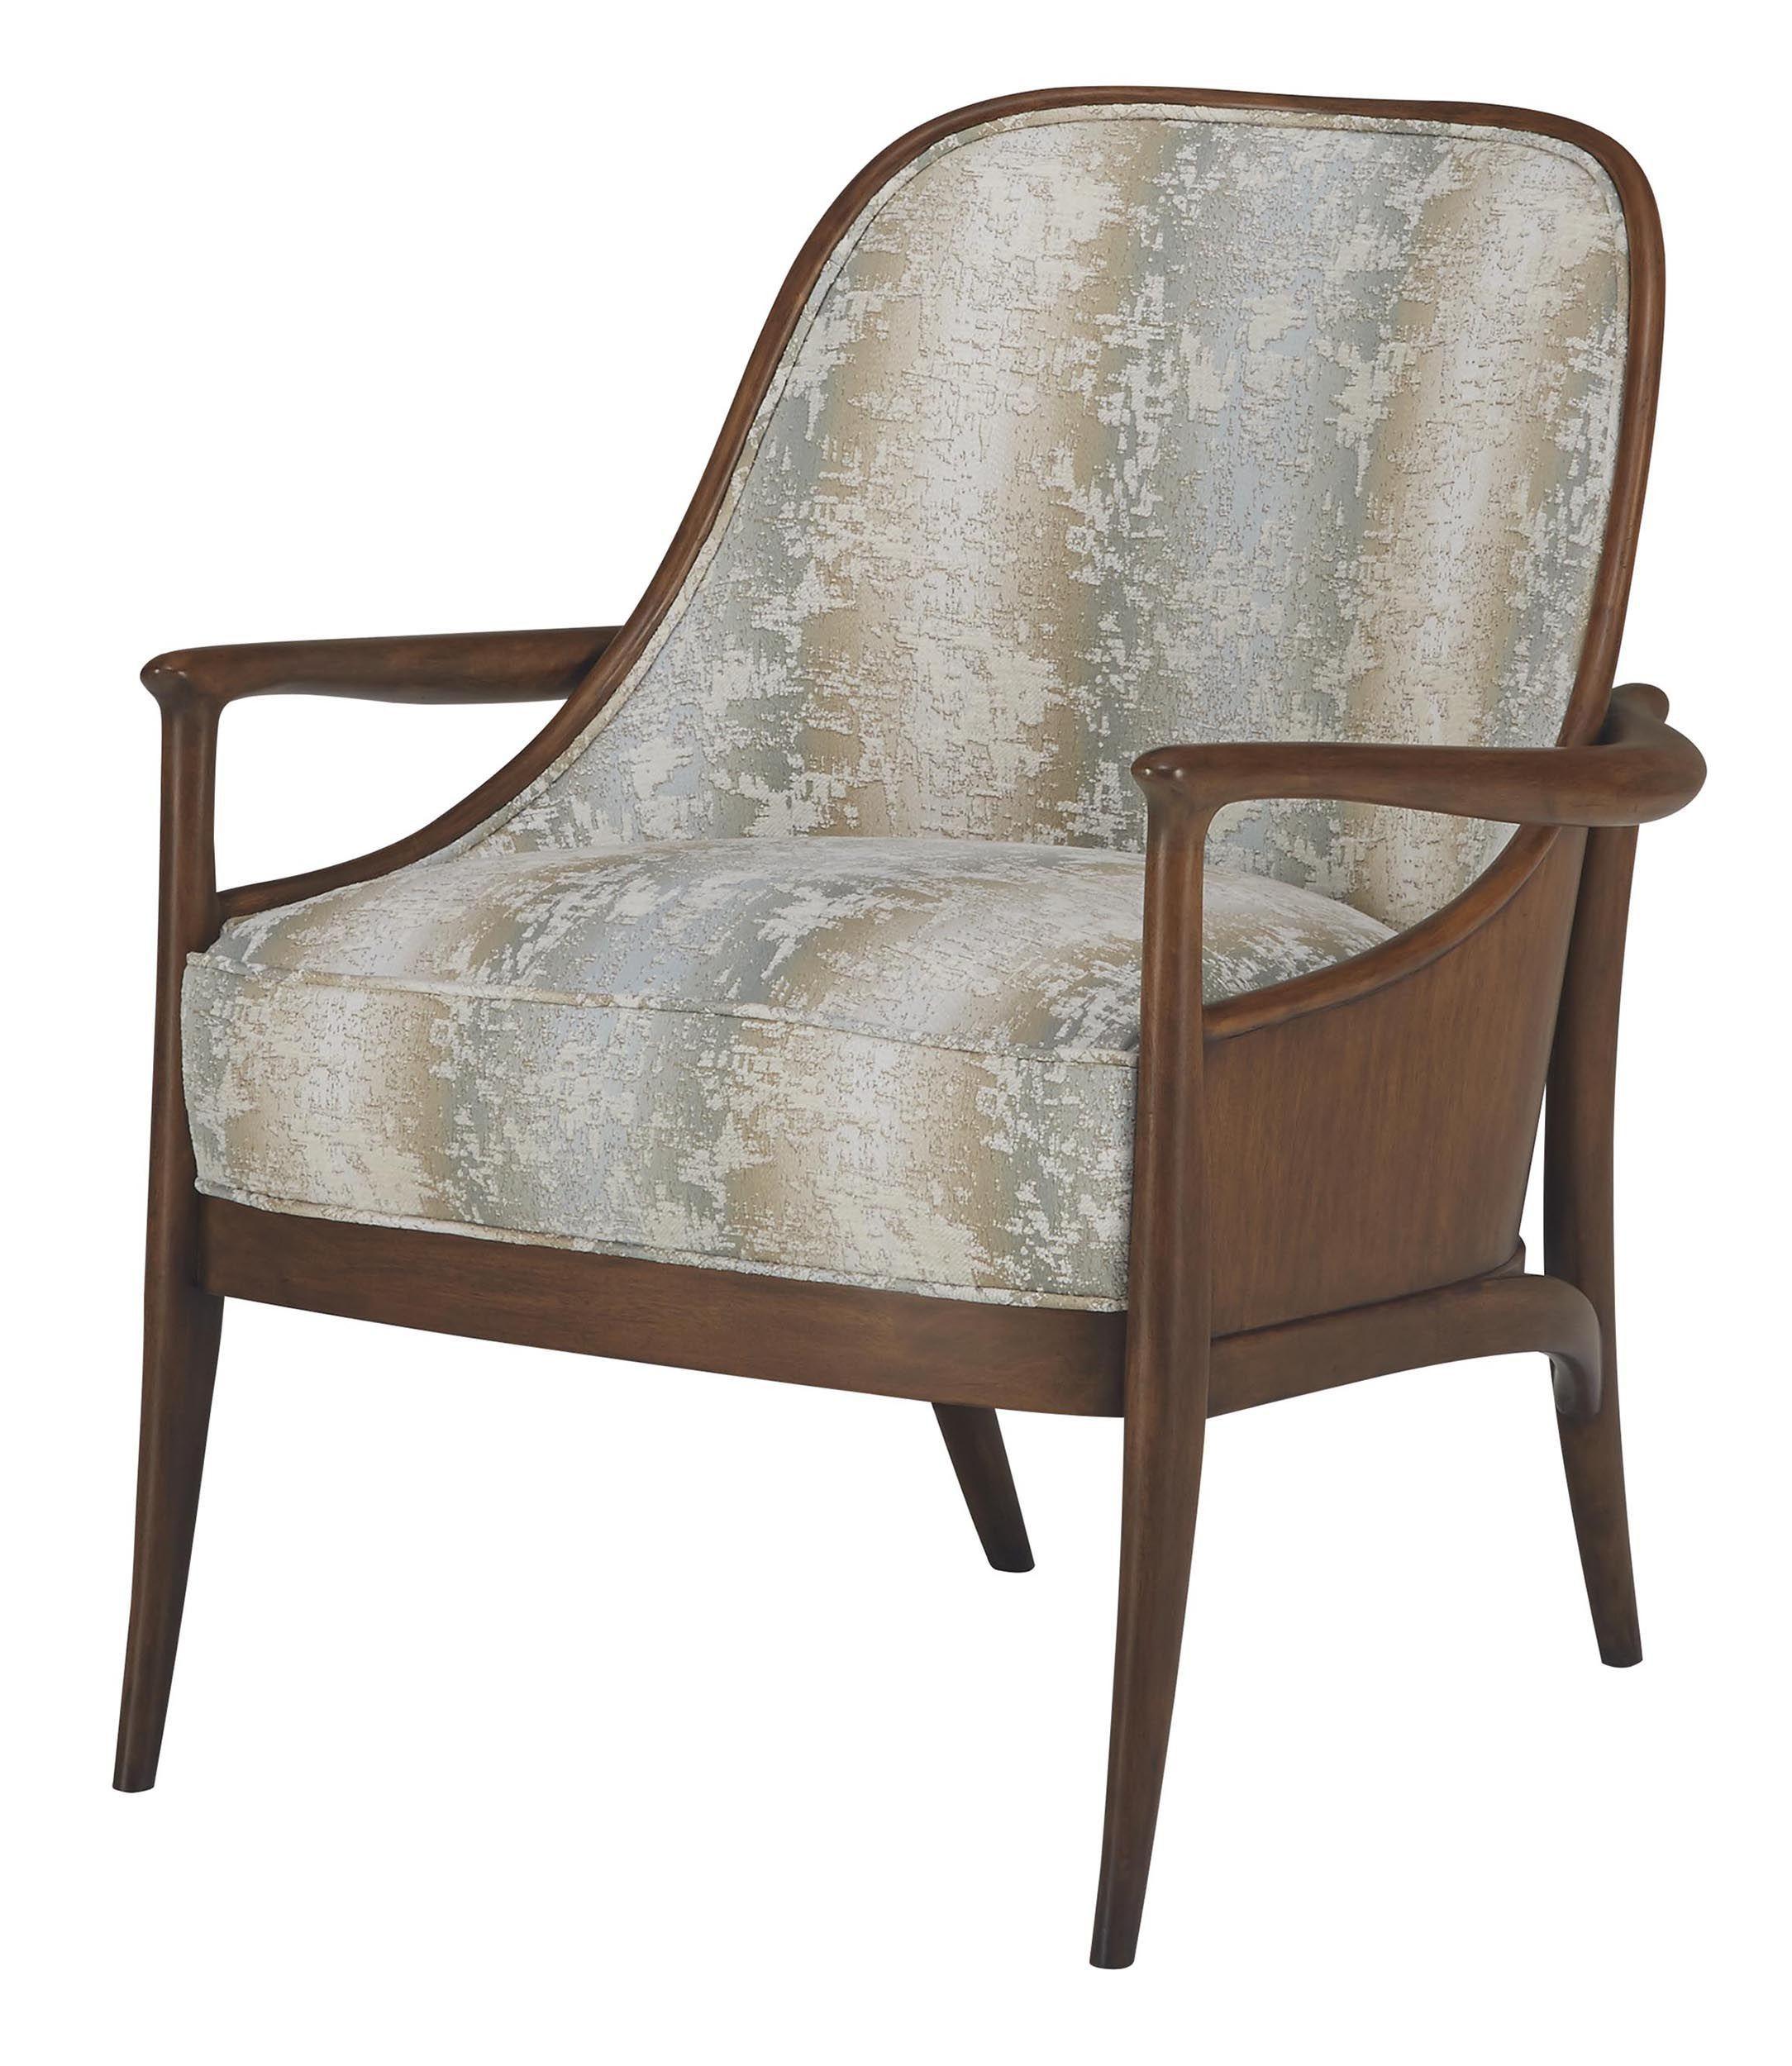 Spa lounge chair - Copenhagen Lounge Chair Spa